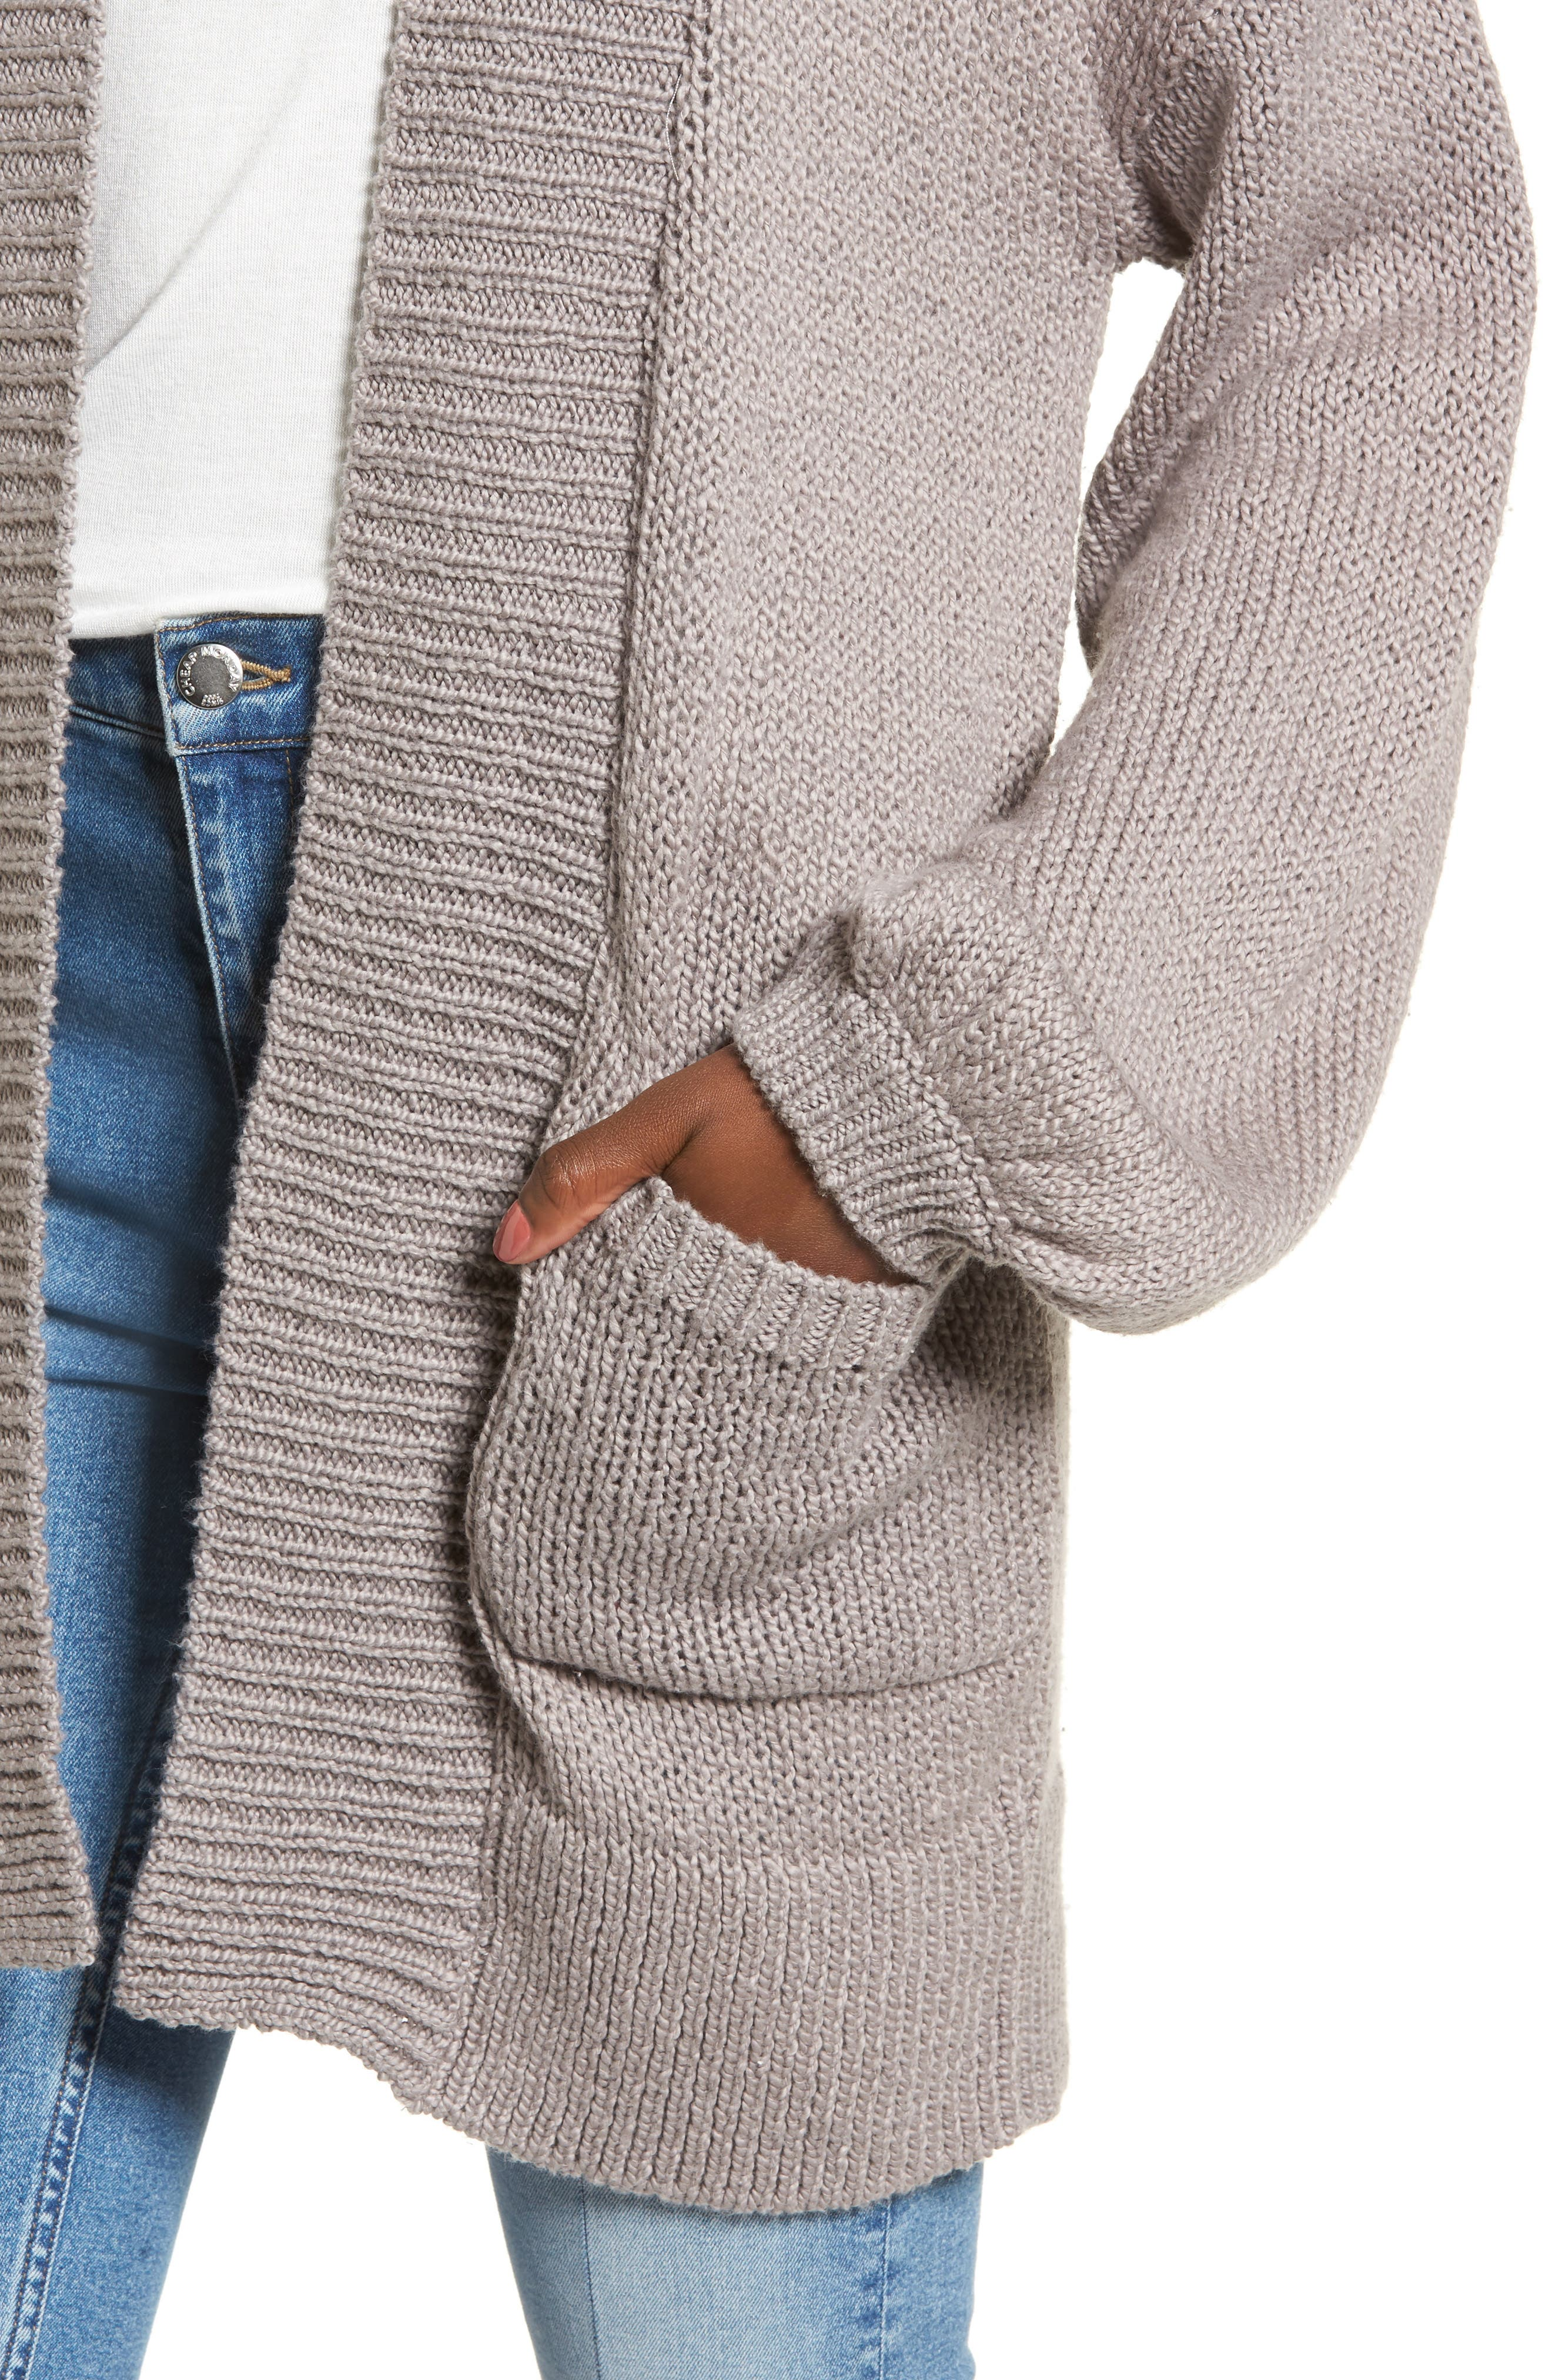 Blouson Sleeve Knit Cardigan,                             Alternate thumbnail 4, color,                             030